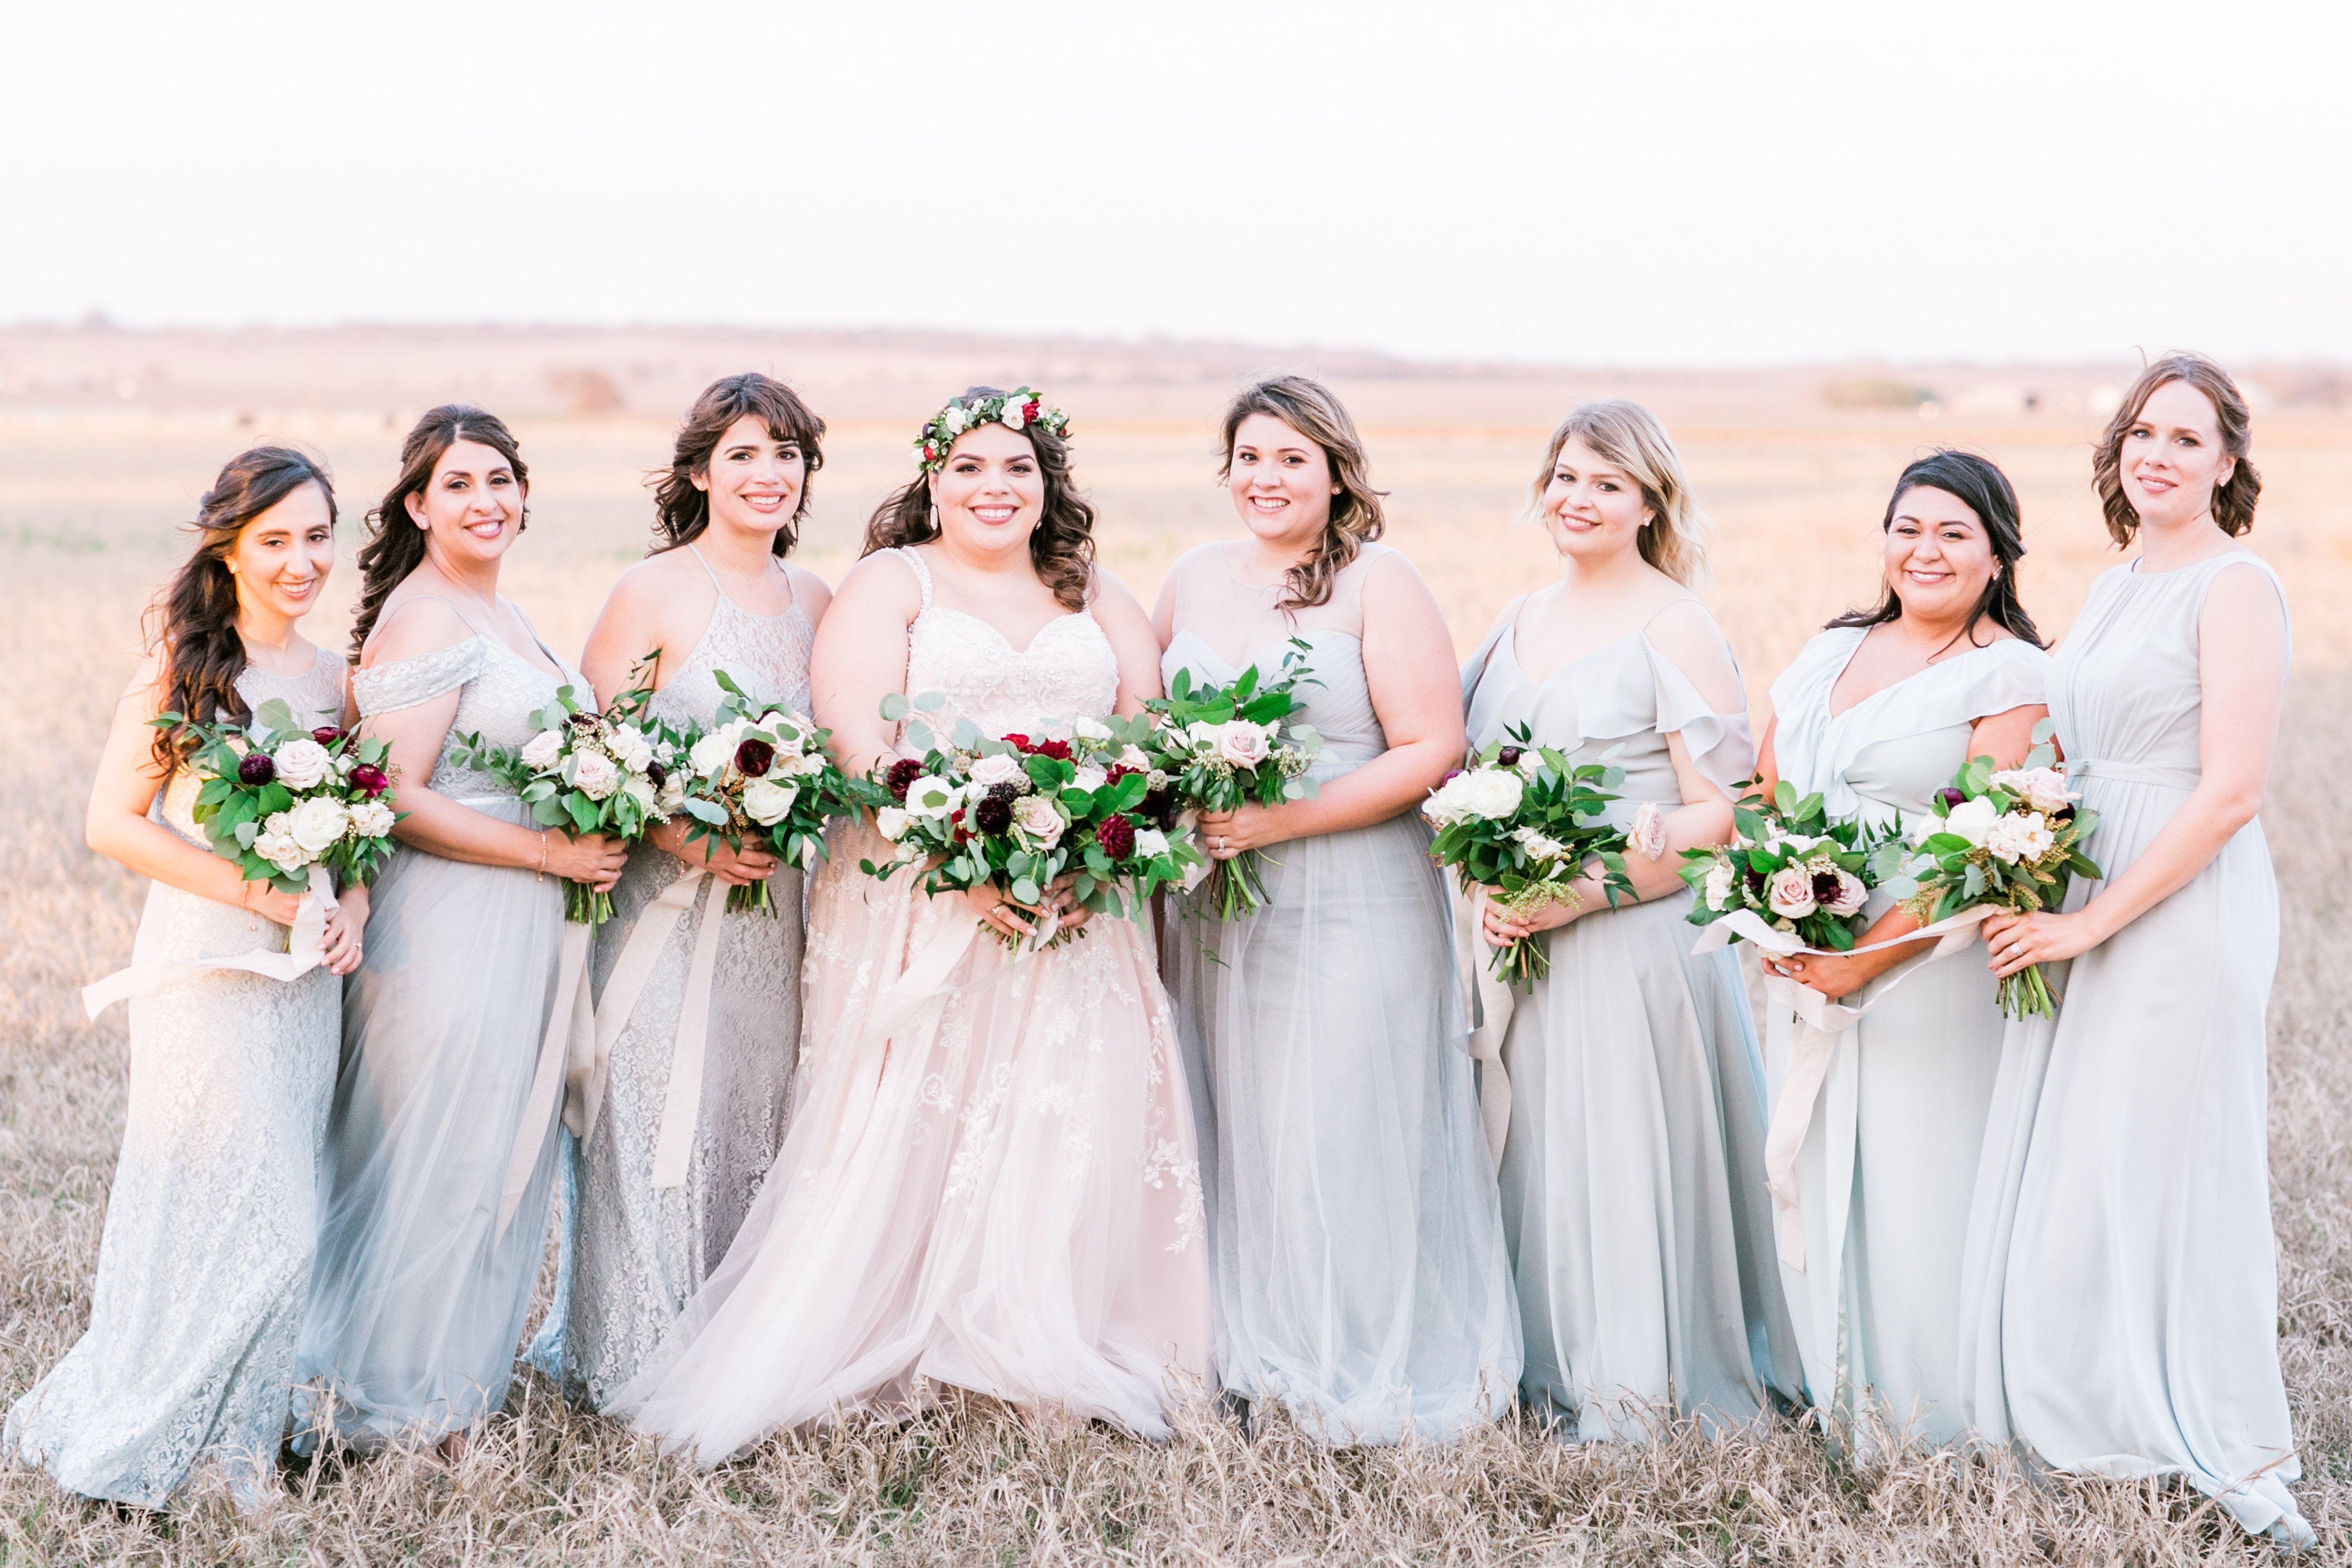 2a6bf43f1 Bella Bridesmaid Flower Girl Dresses - raveitsafe